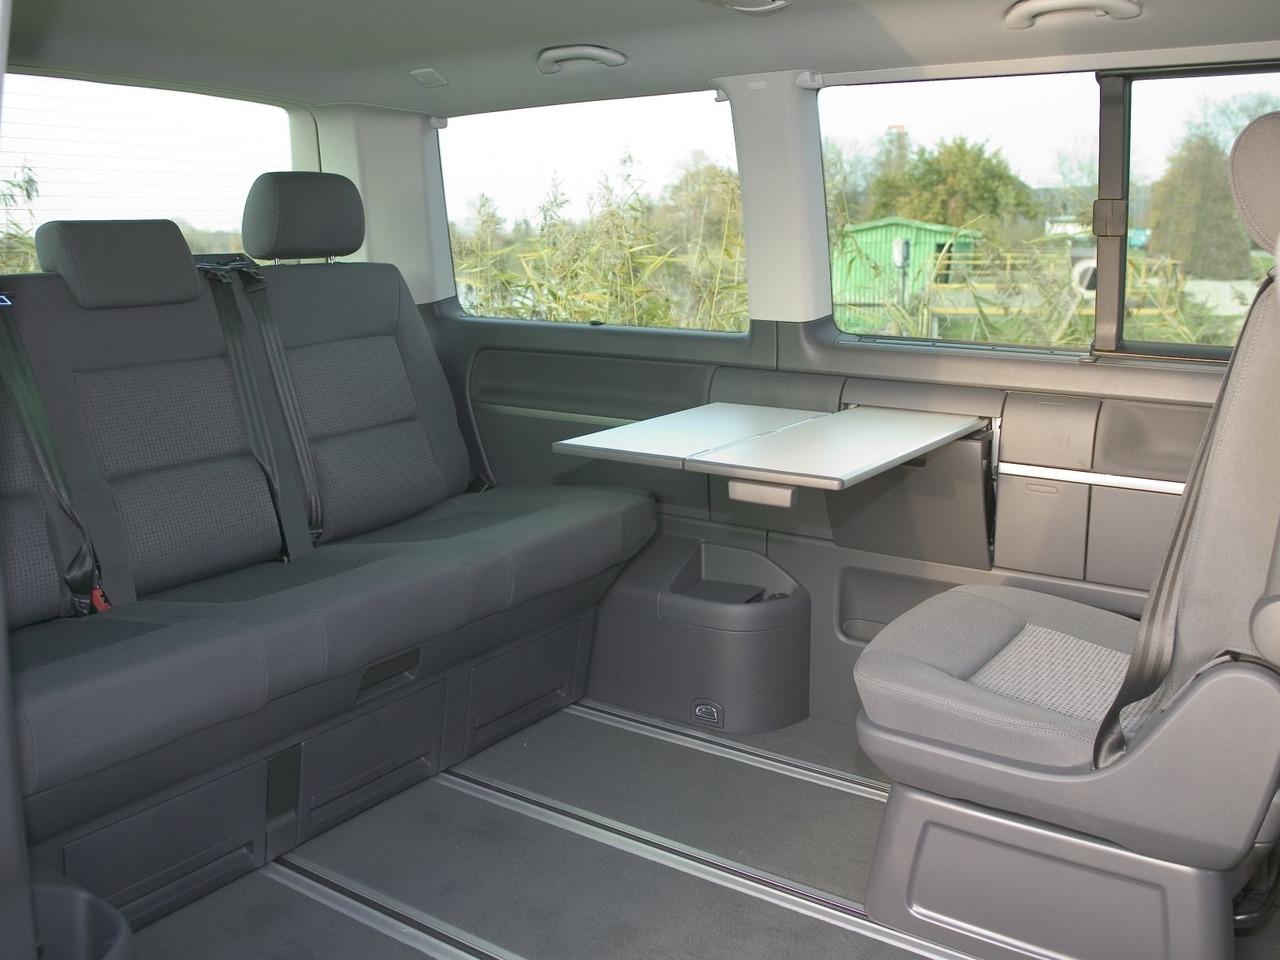 volkswagen multivan t5 2 5 tdi 174 hp. Black Bedroom Furniture Sets. Home Design Ideas